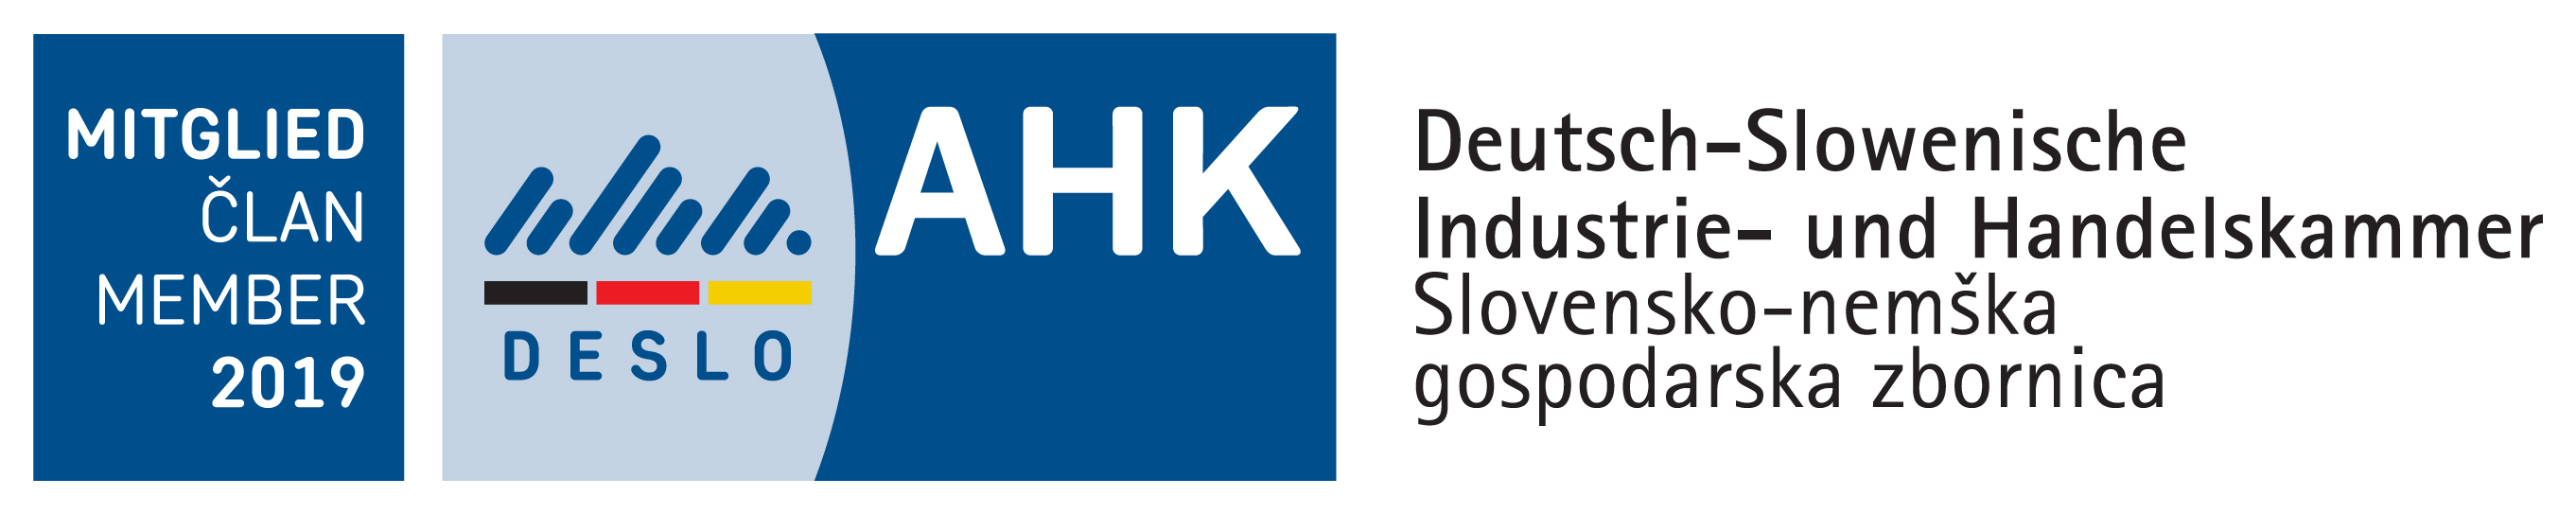 DE-SLO - German-Slovene Chamber of Commerce and Industry